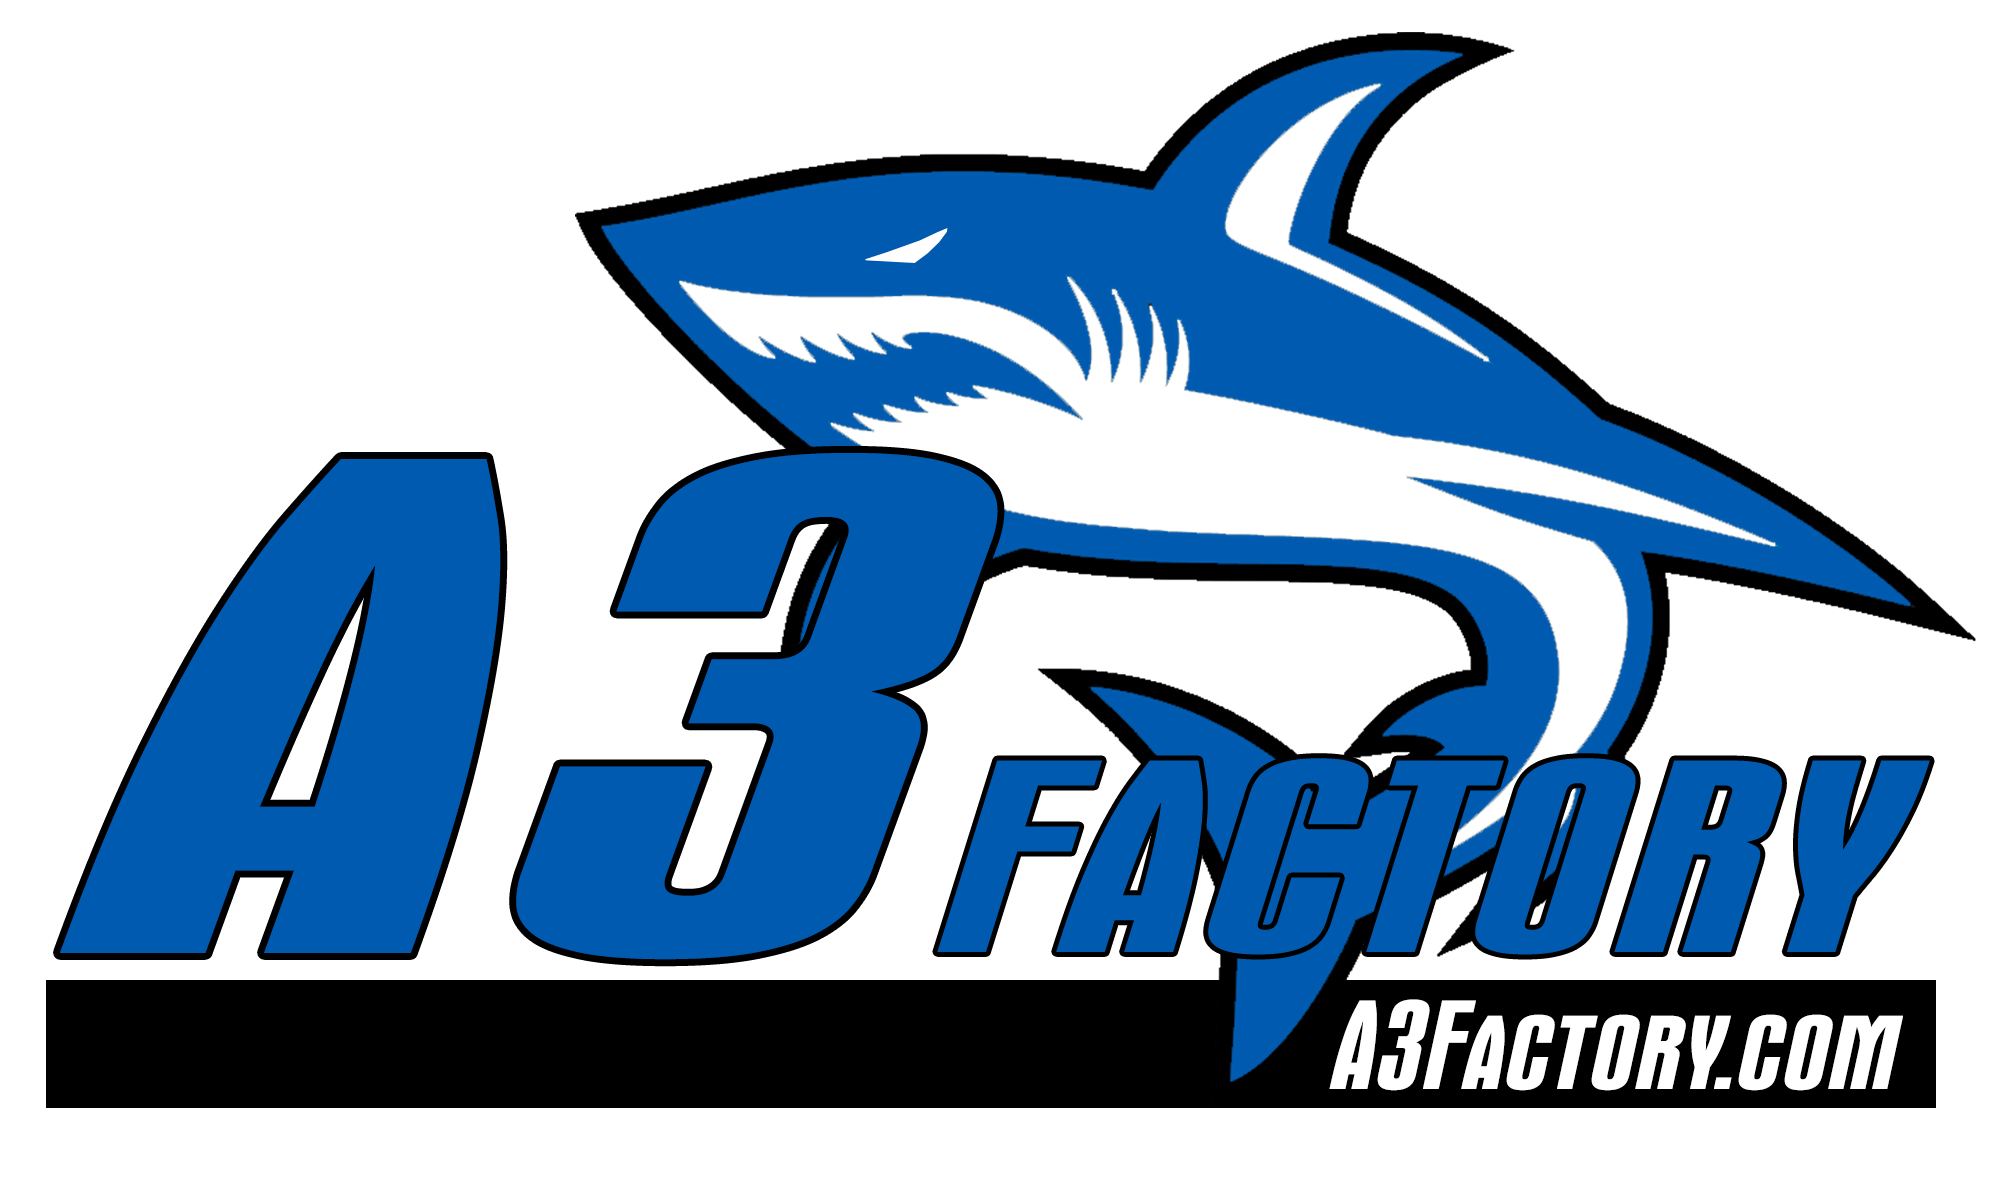 A3F-Logo-3l9kjx6.png